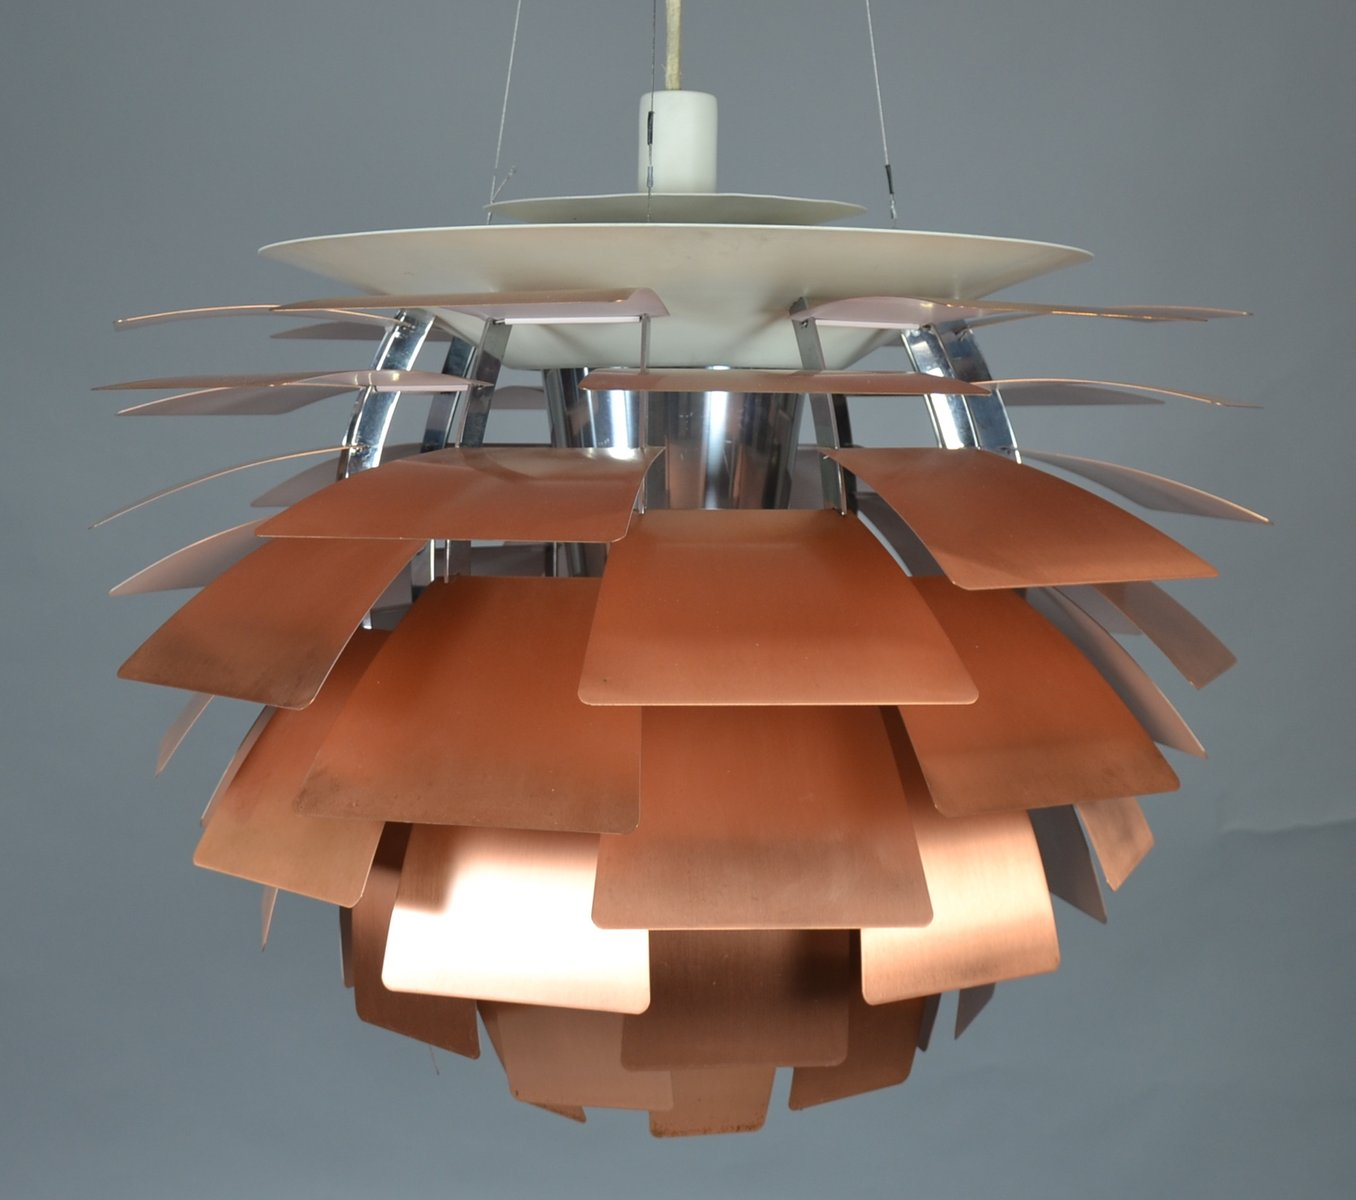 Ph artichoke copper lamp by poul henningsen for louis poulsen 1950s